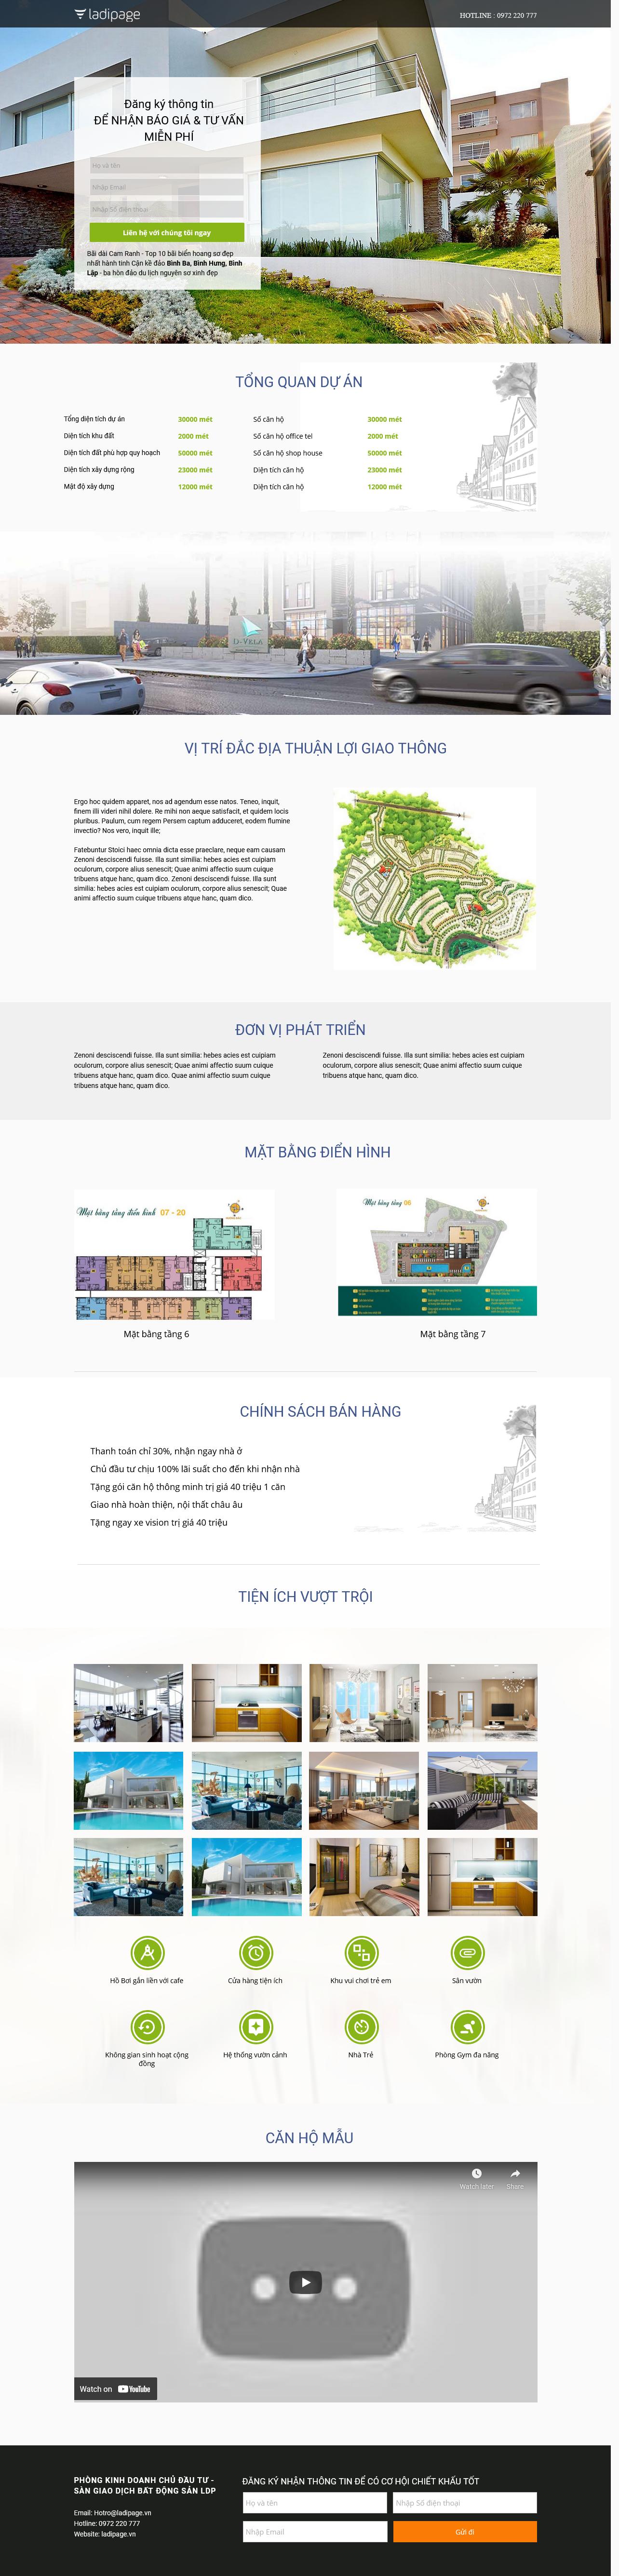 Thiết kế website Thiết kế webiste landingpage bat-dong-san Bất động sản 17